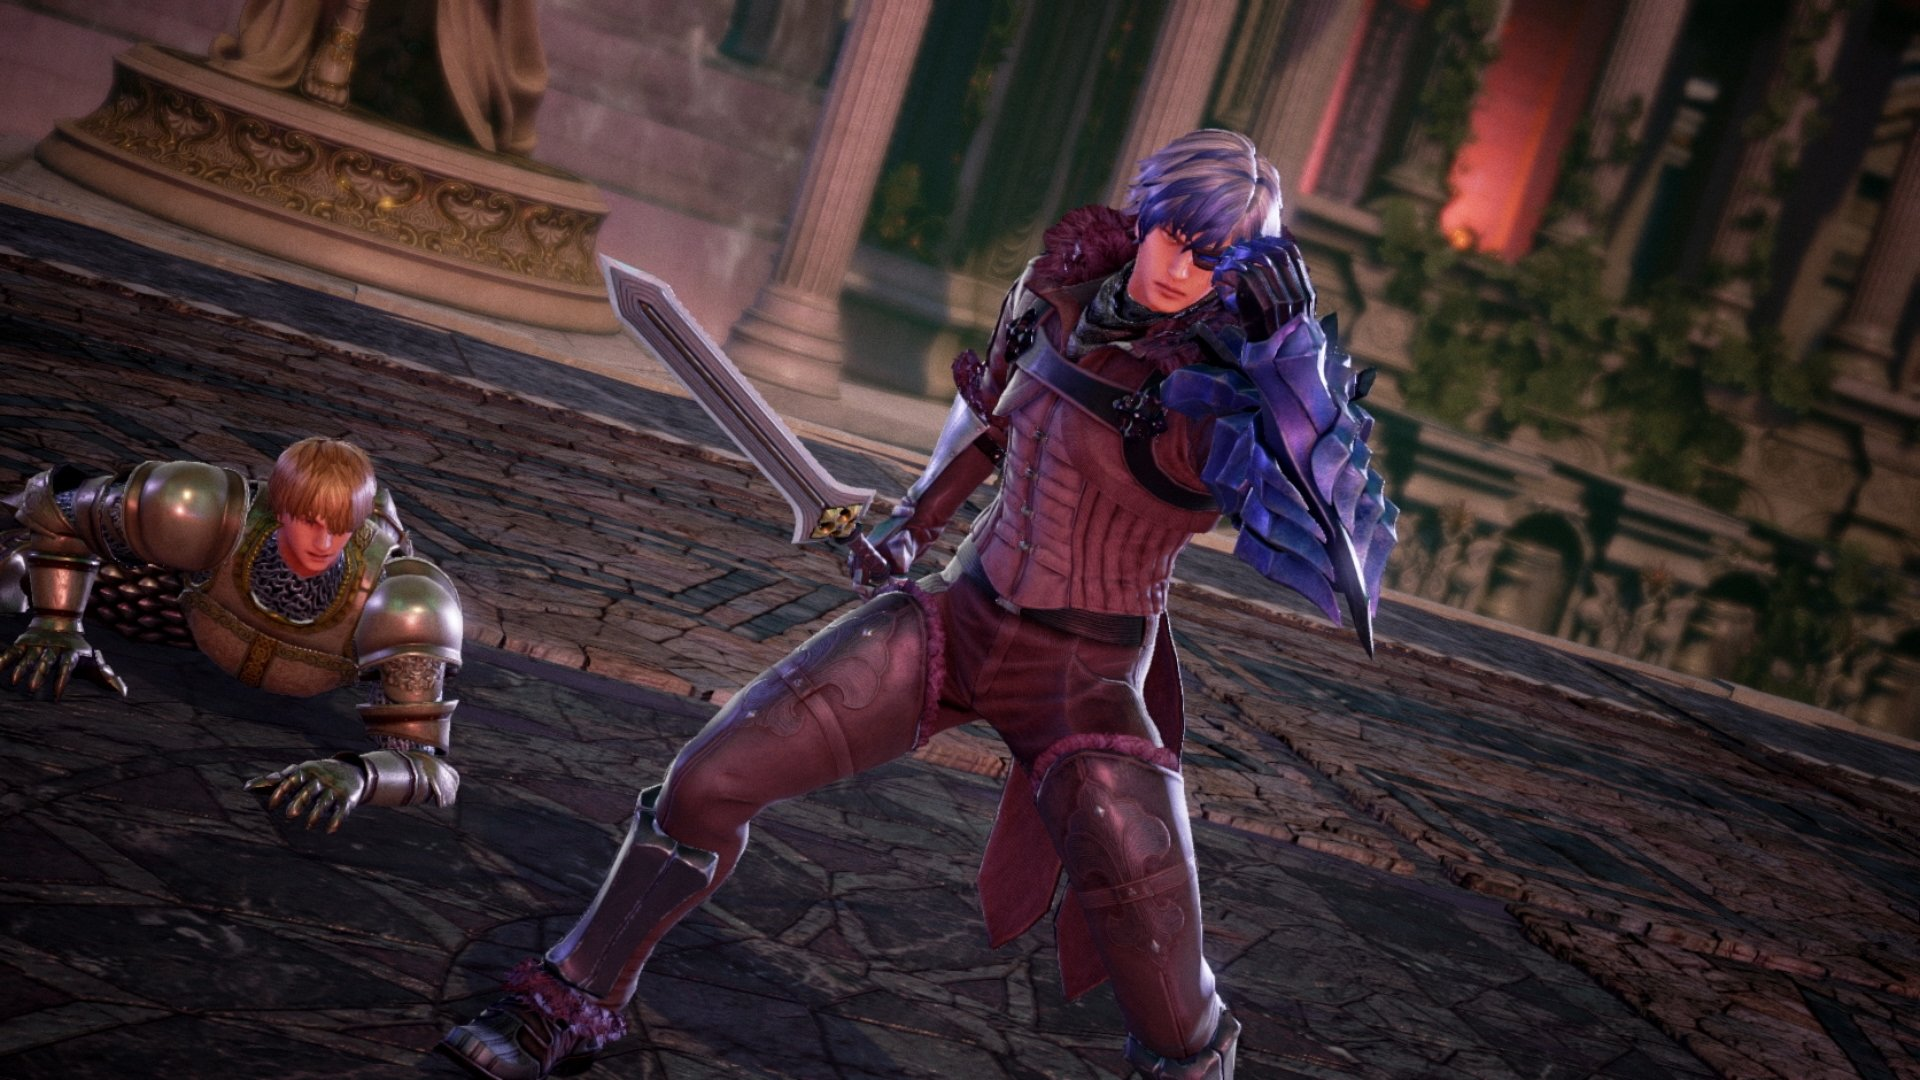 Espectacular gameplay de Soul Calibur VI